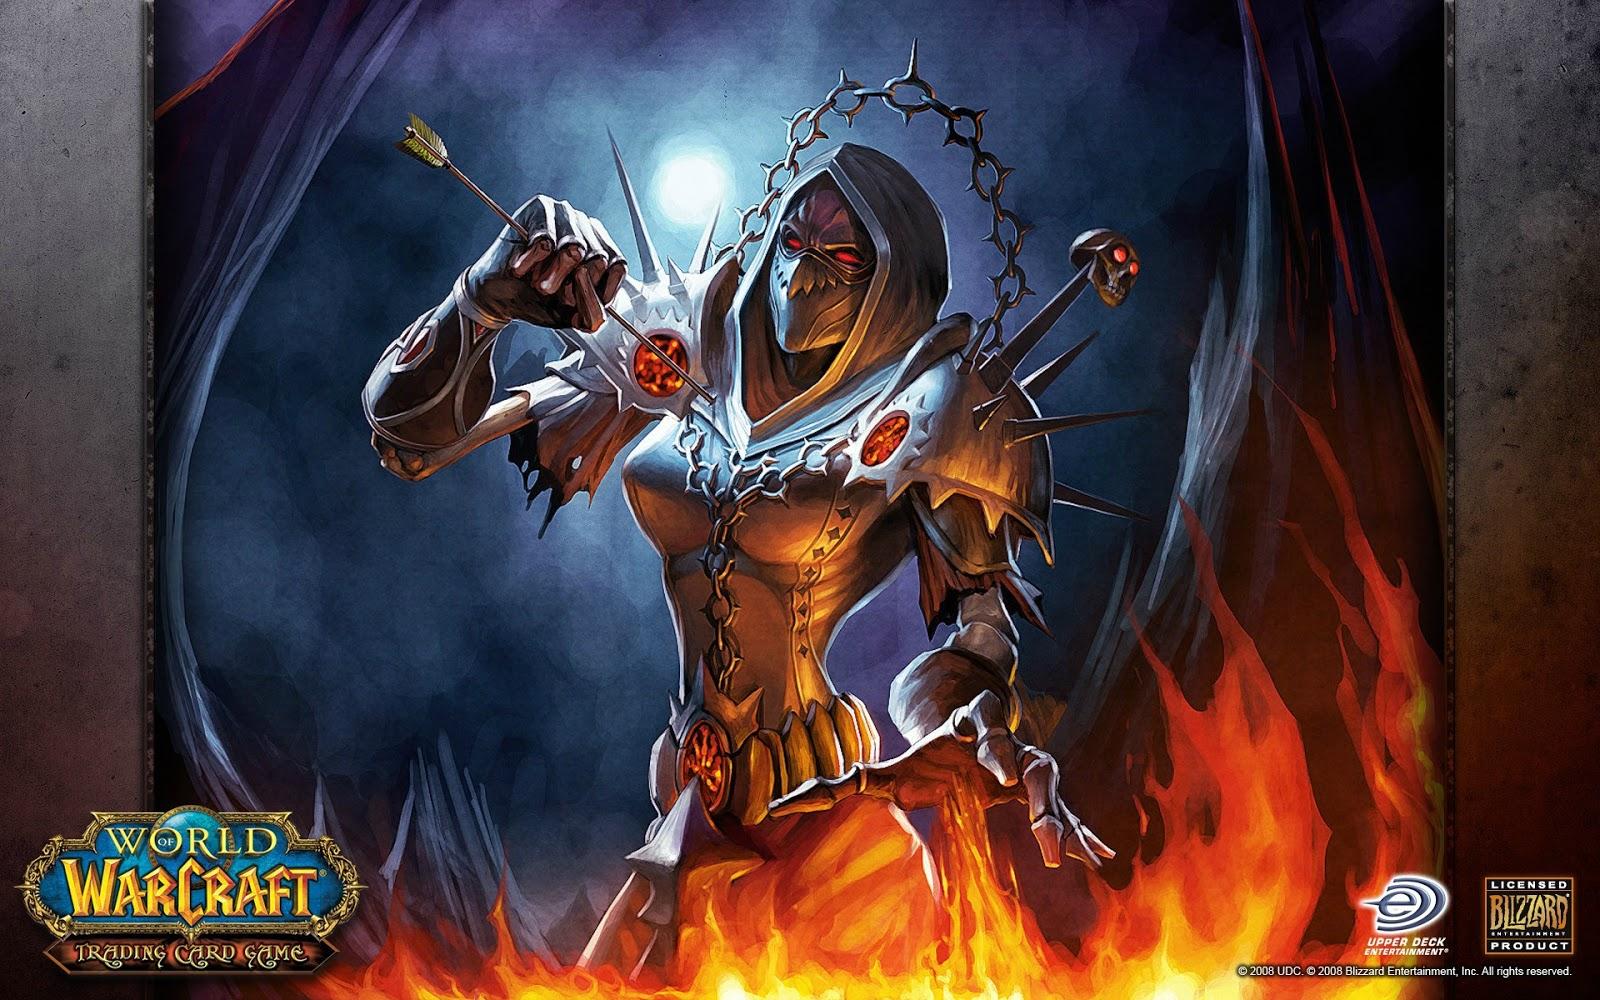 100 Hq World Of Warcraft Wallpapers Hd 4k 2019 Www